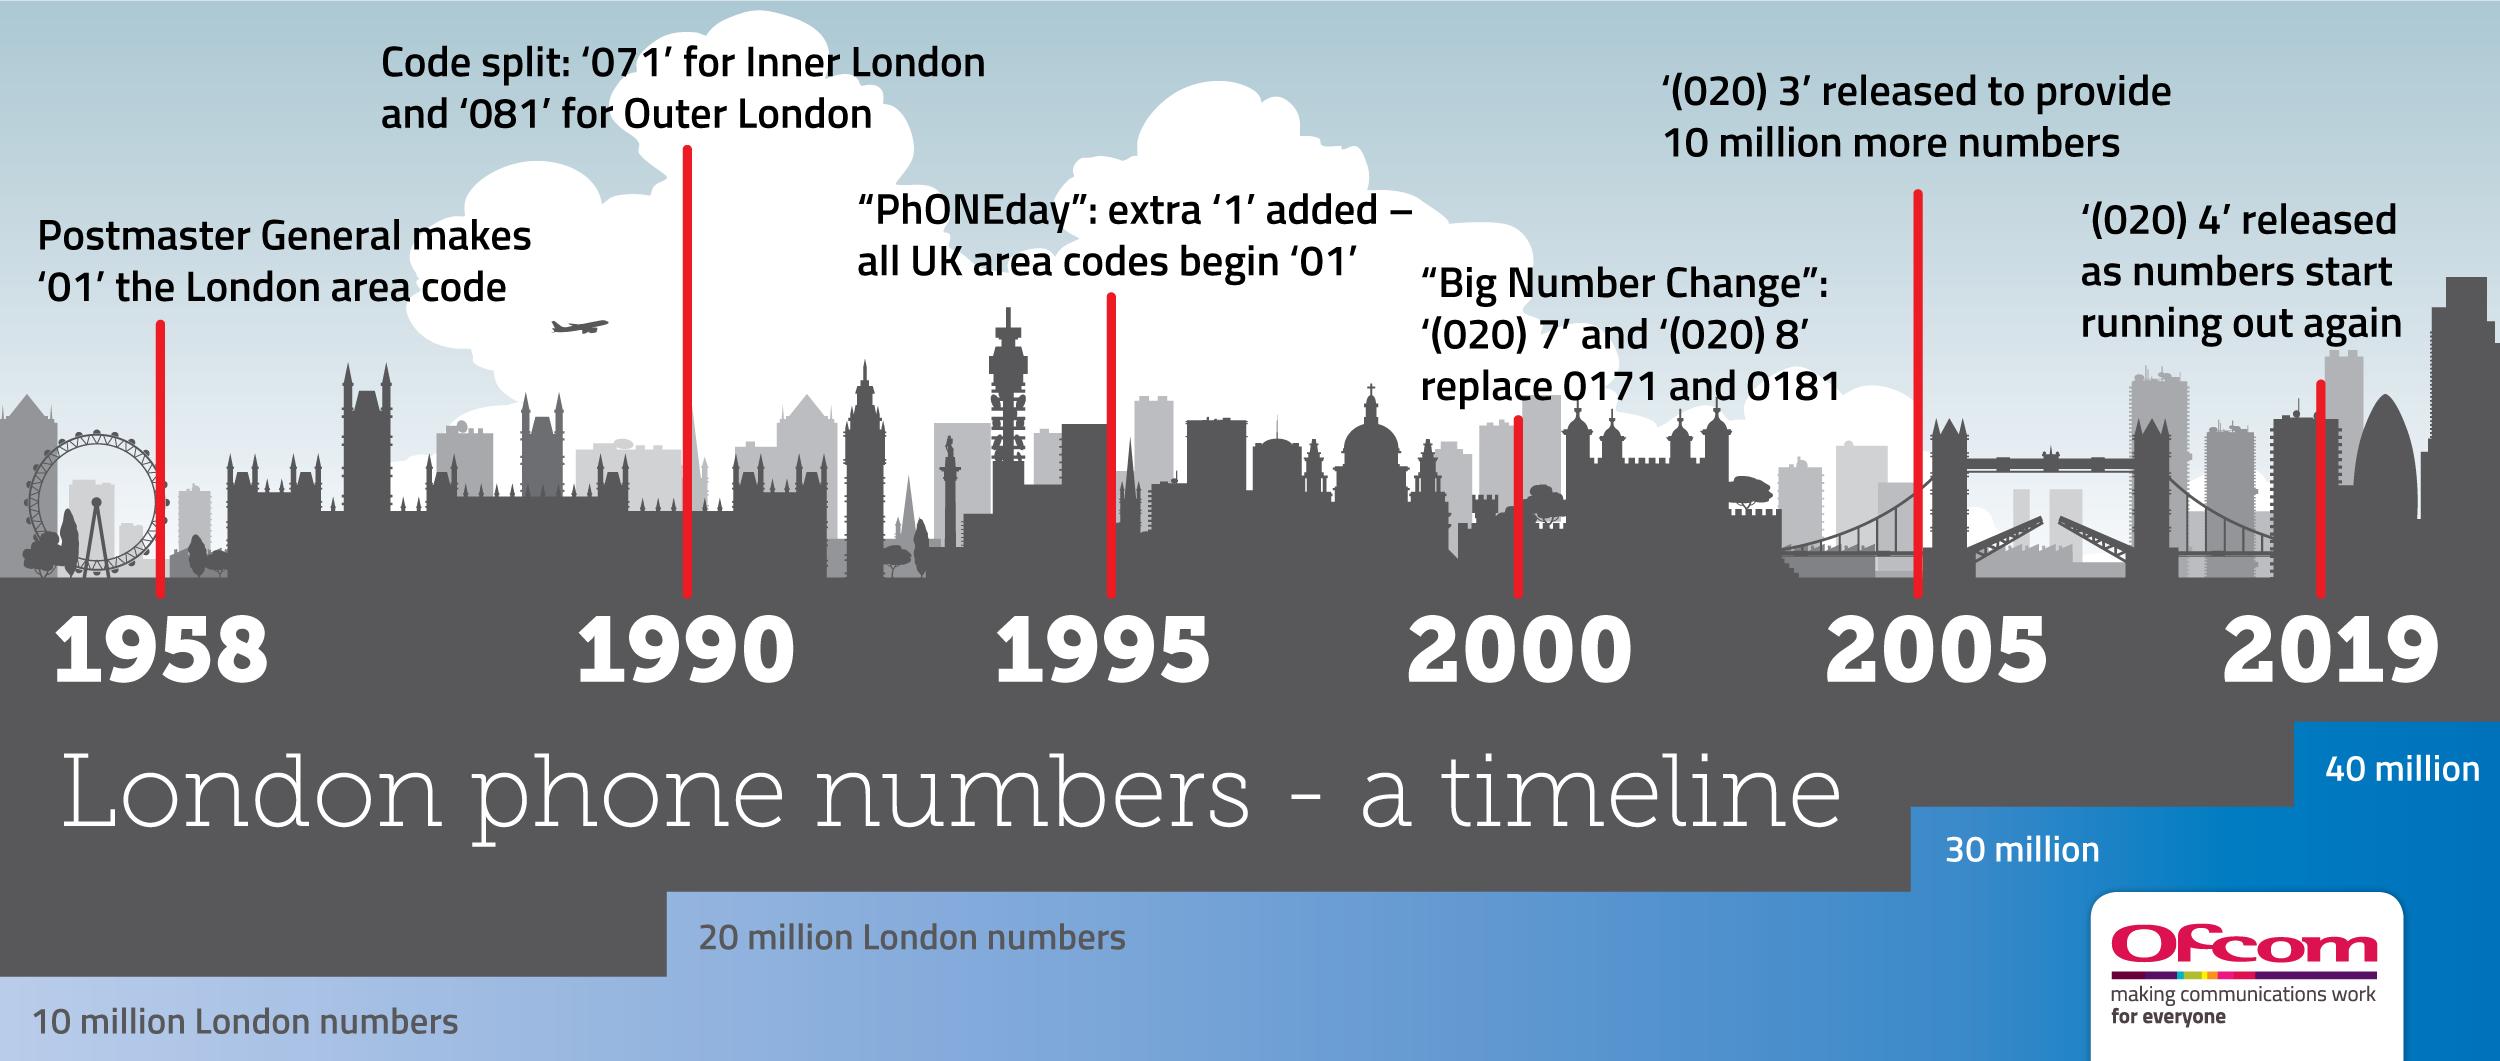 London Numbers Timeline